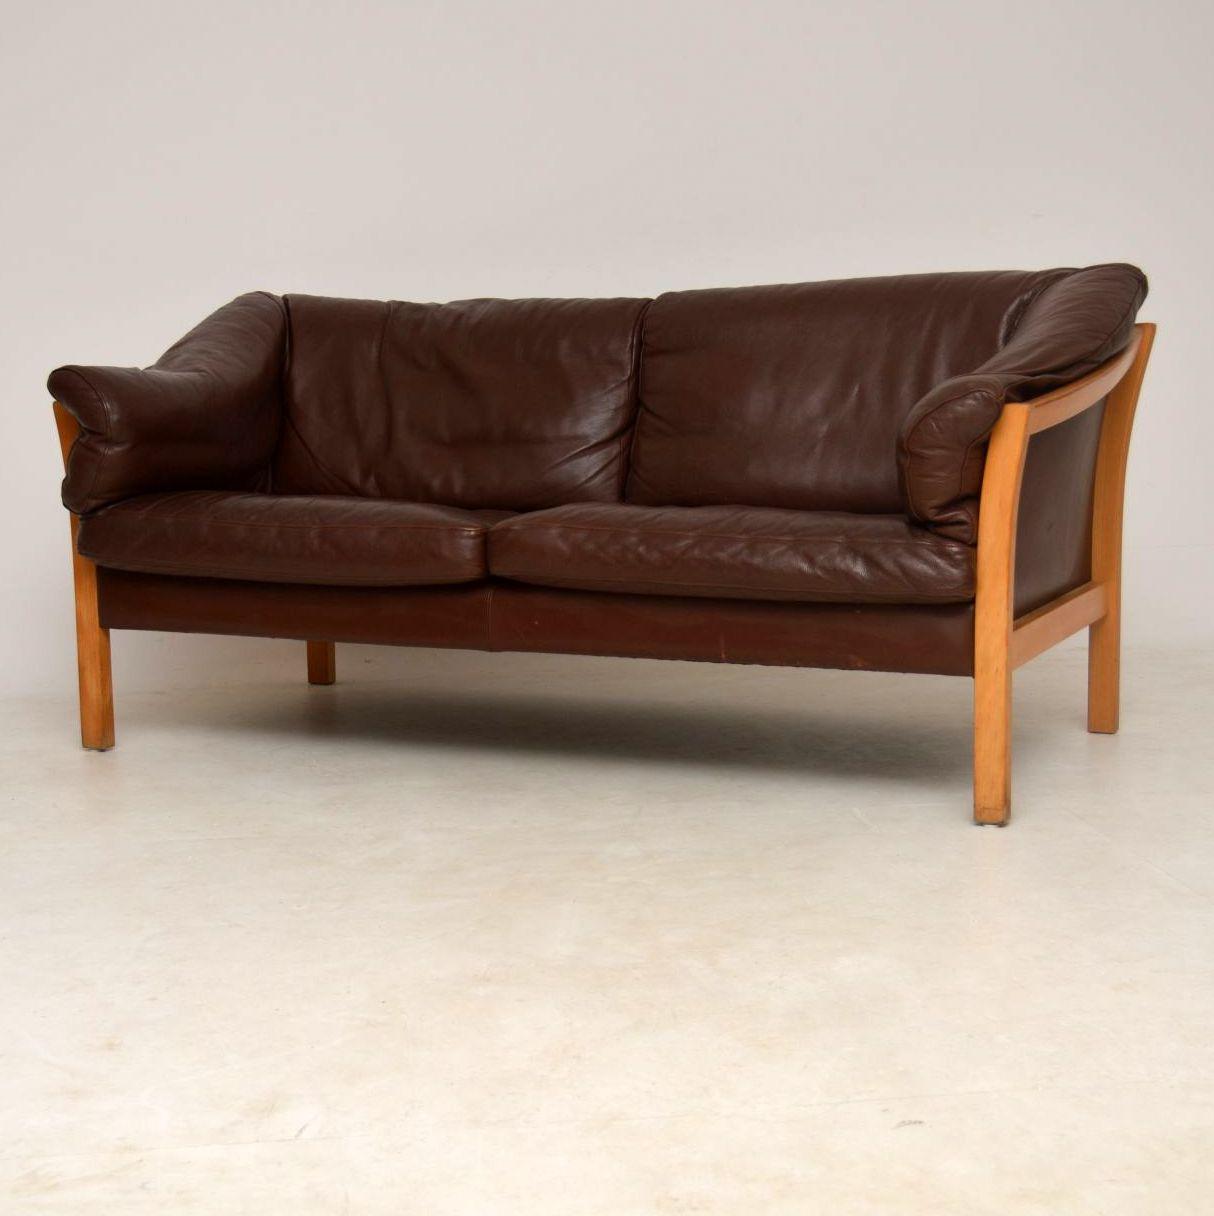 1960 S Danish Vintage Leather Sofa